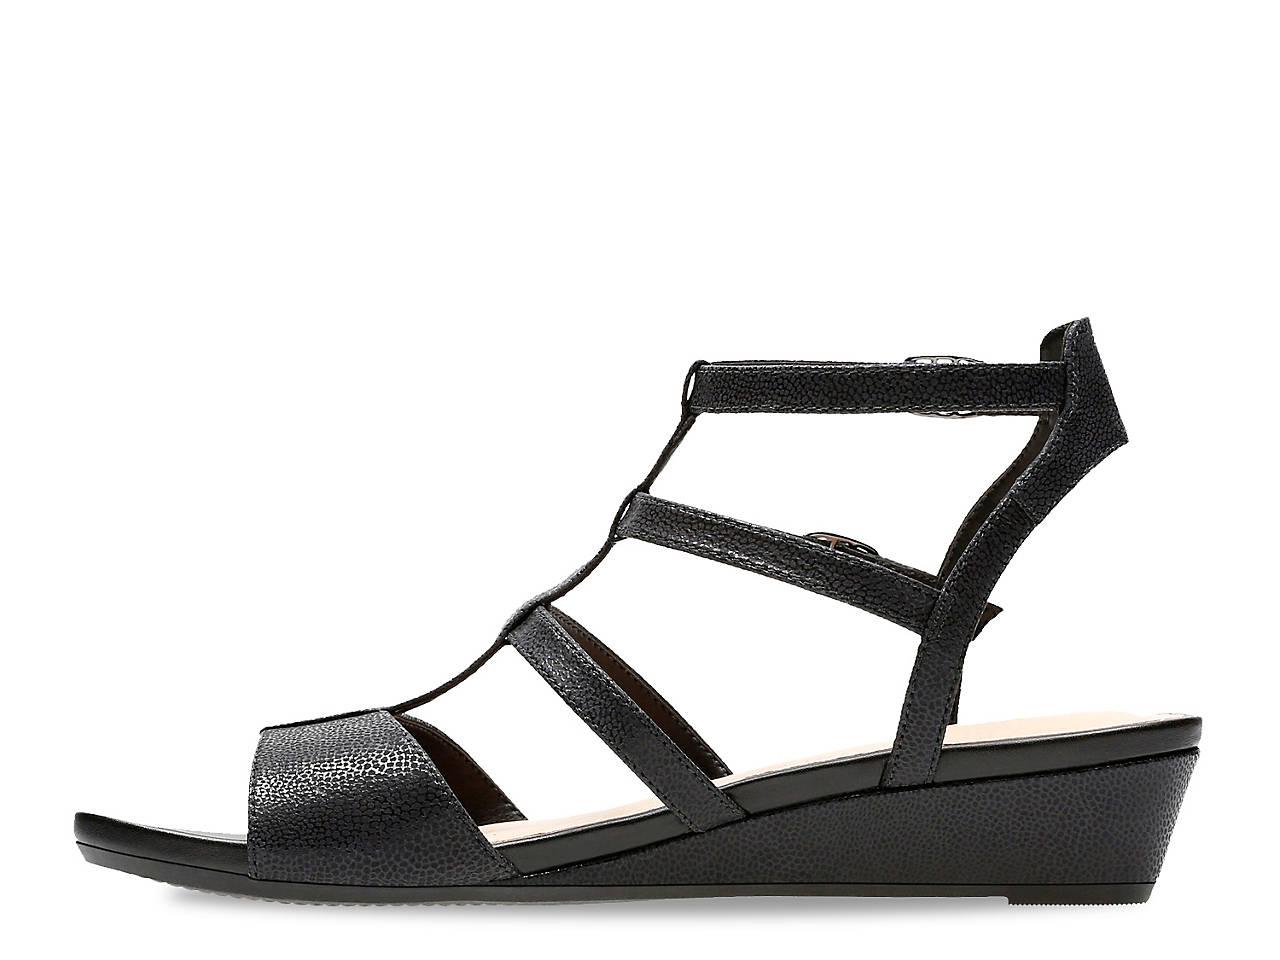 8de34eece Clarks Parram Spice Wedge Gladiator Sandal Women s Shoes